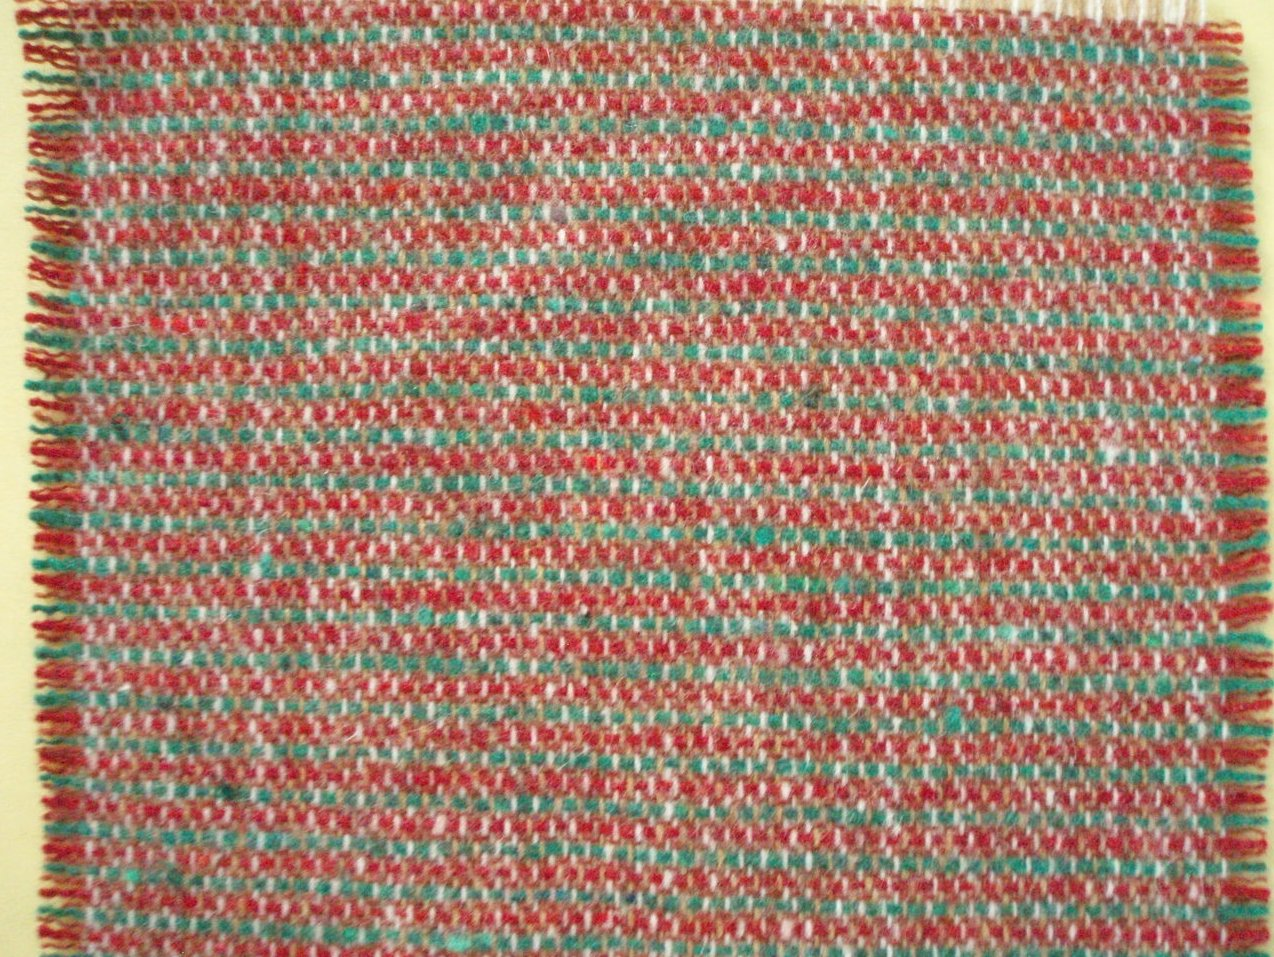 Dollhouse miniature Carpet woven wool 6 x 5